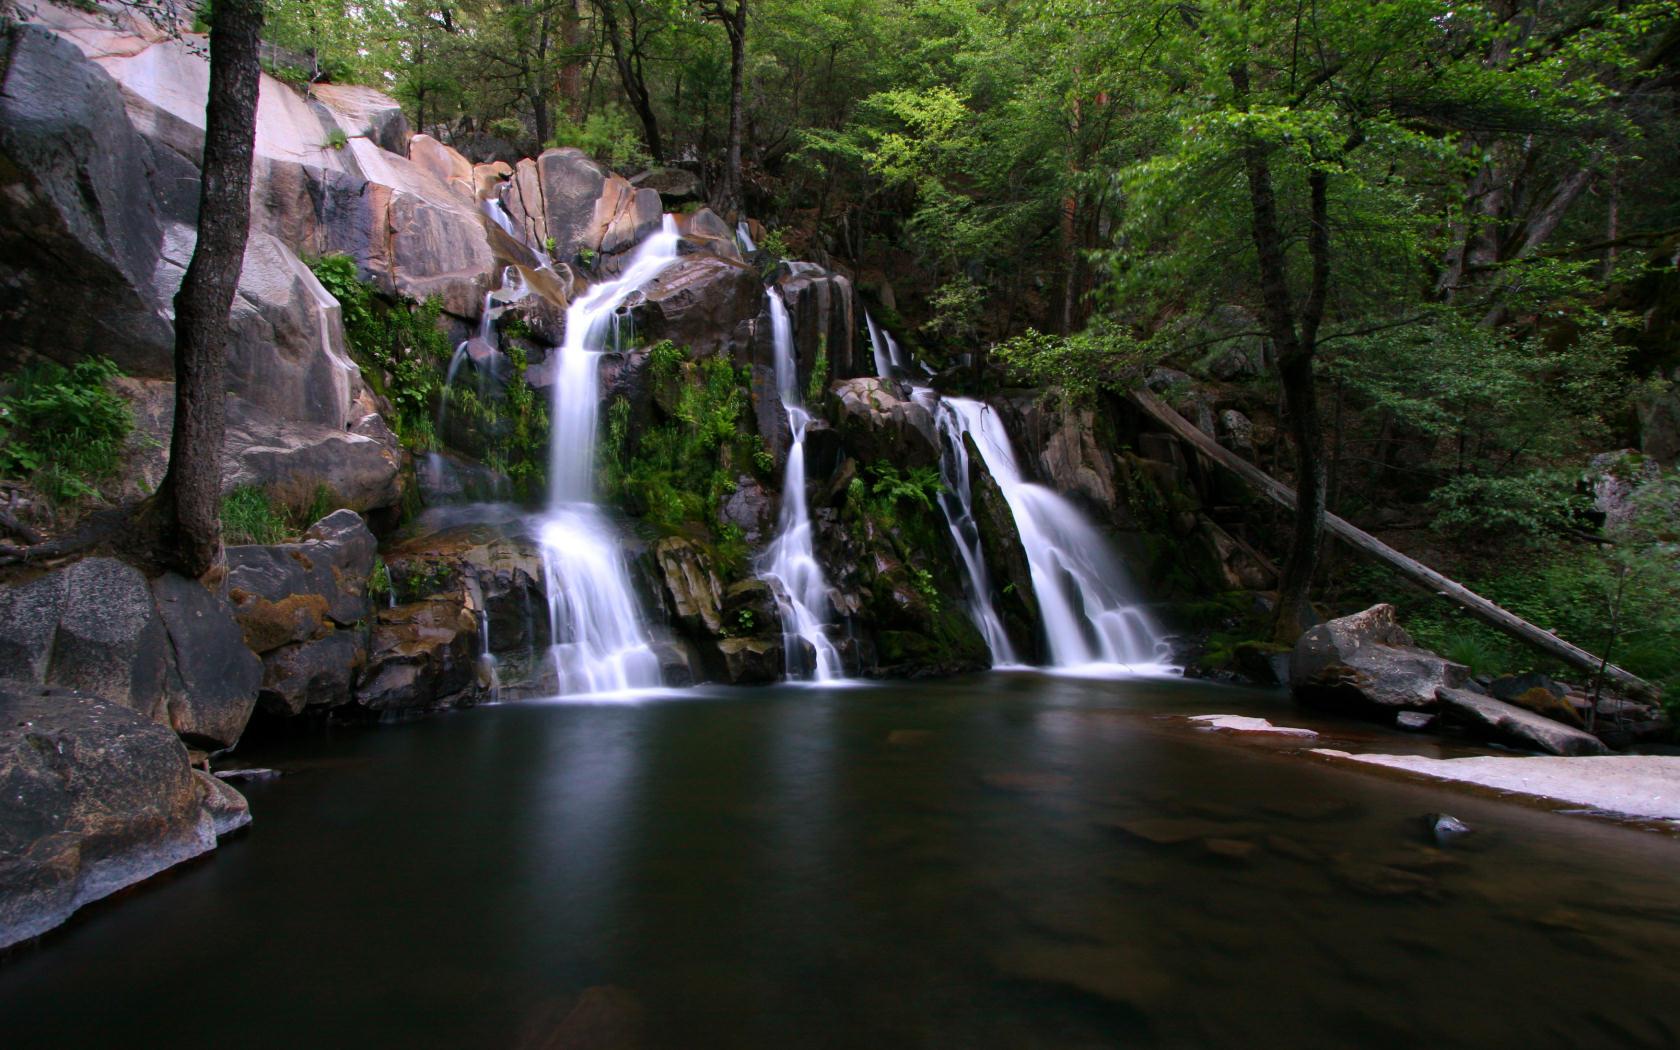 free yosemite wallpapers - corlieu falls